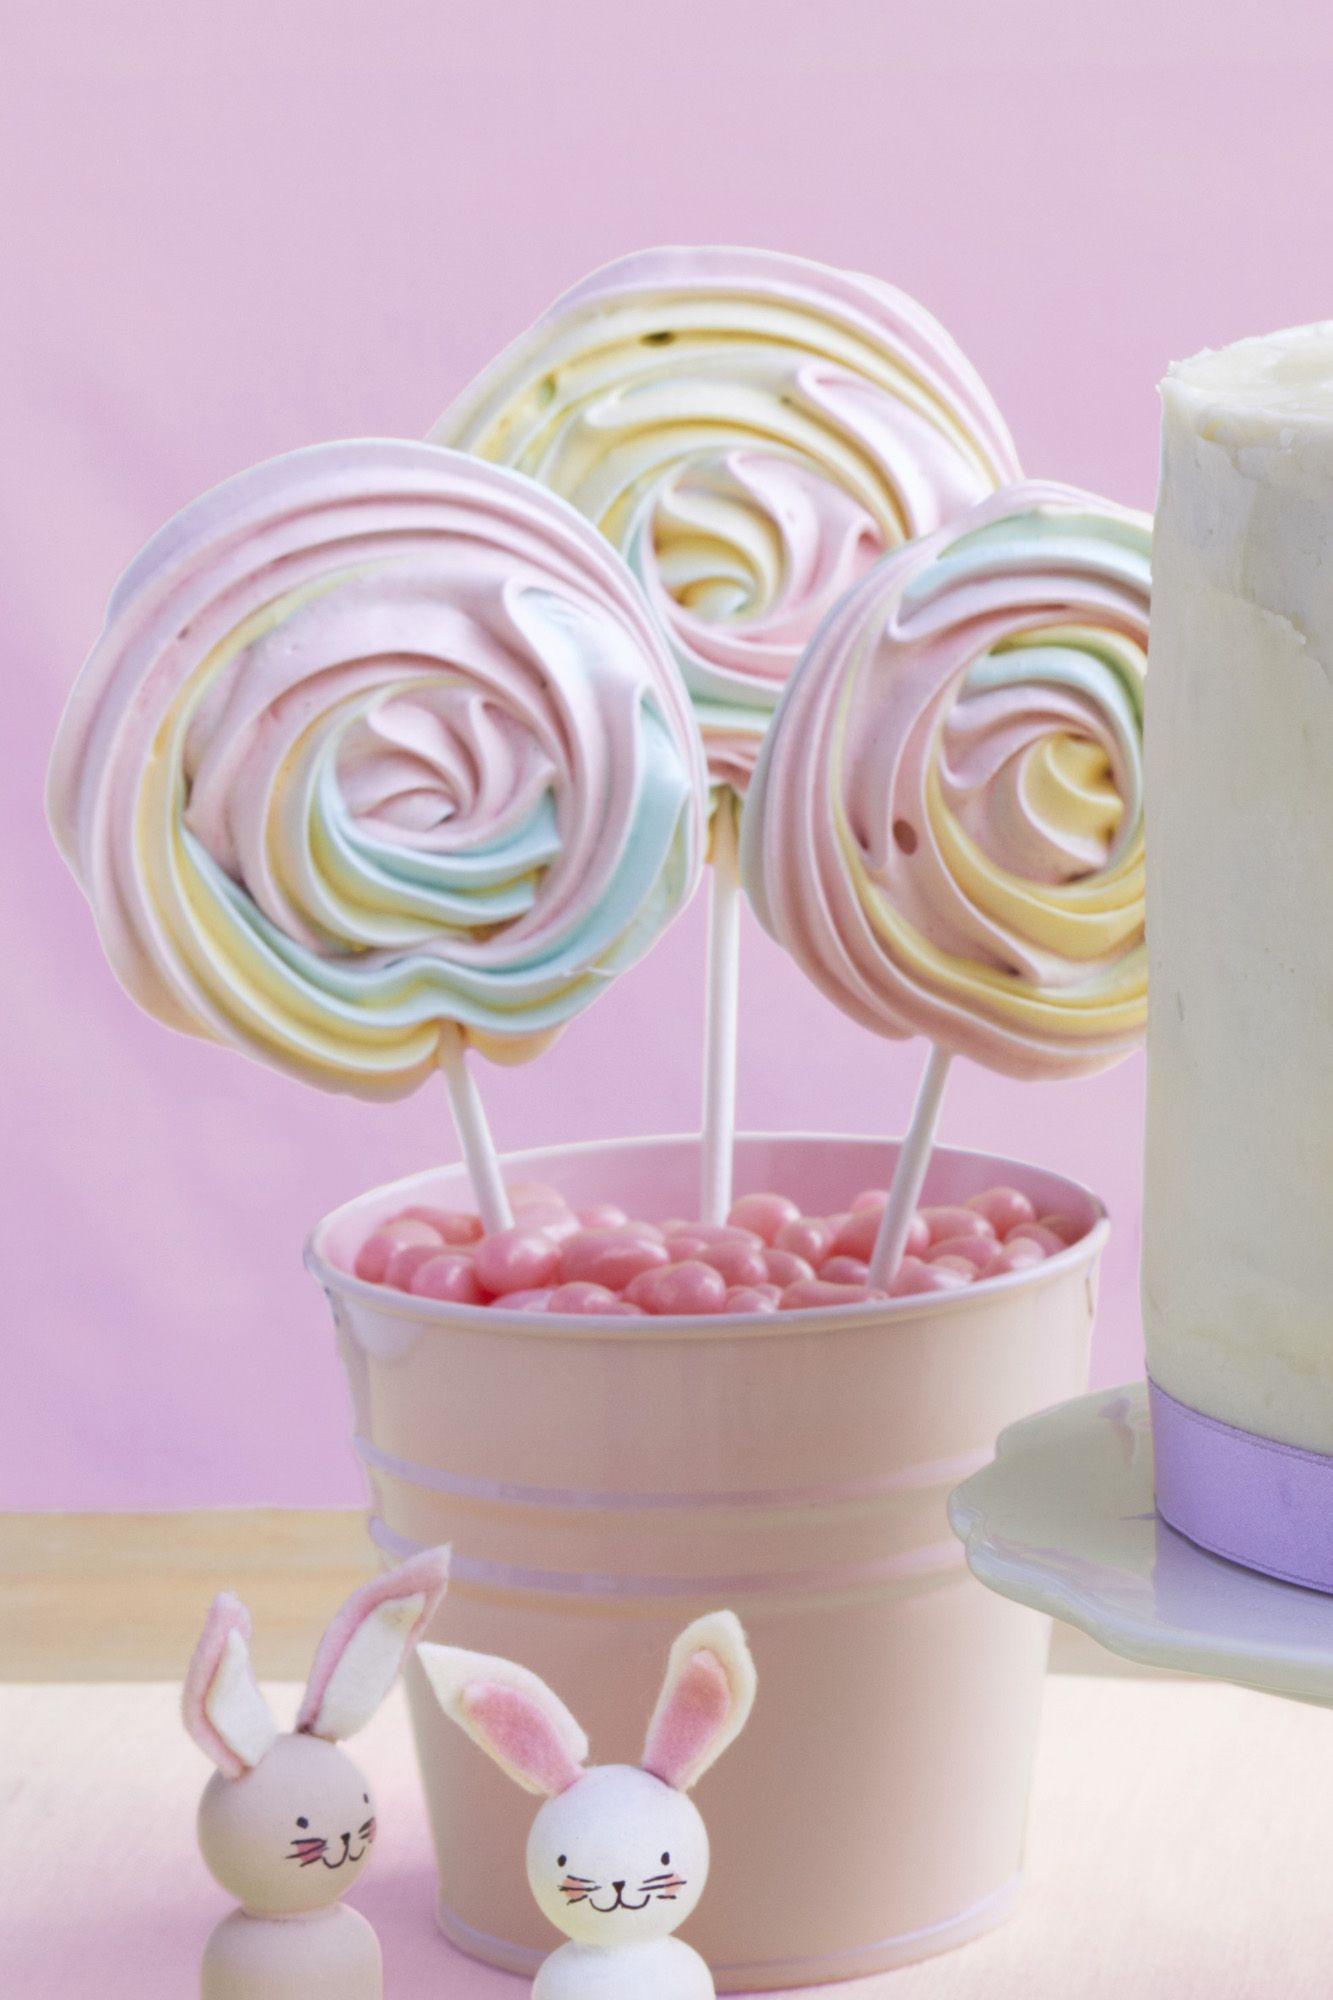 How To Make Meringue Pops Best Meringue Pops Recipe